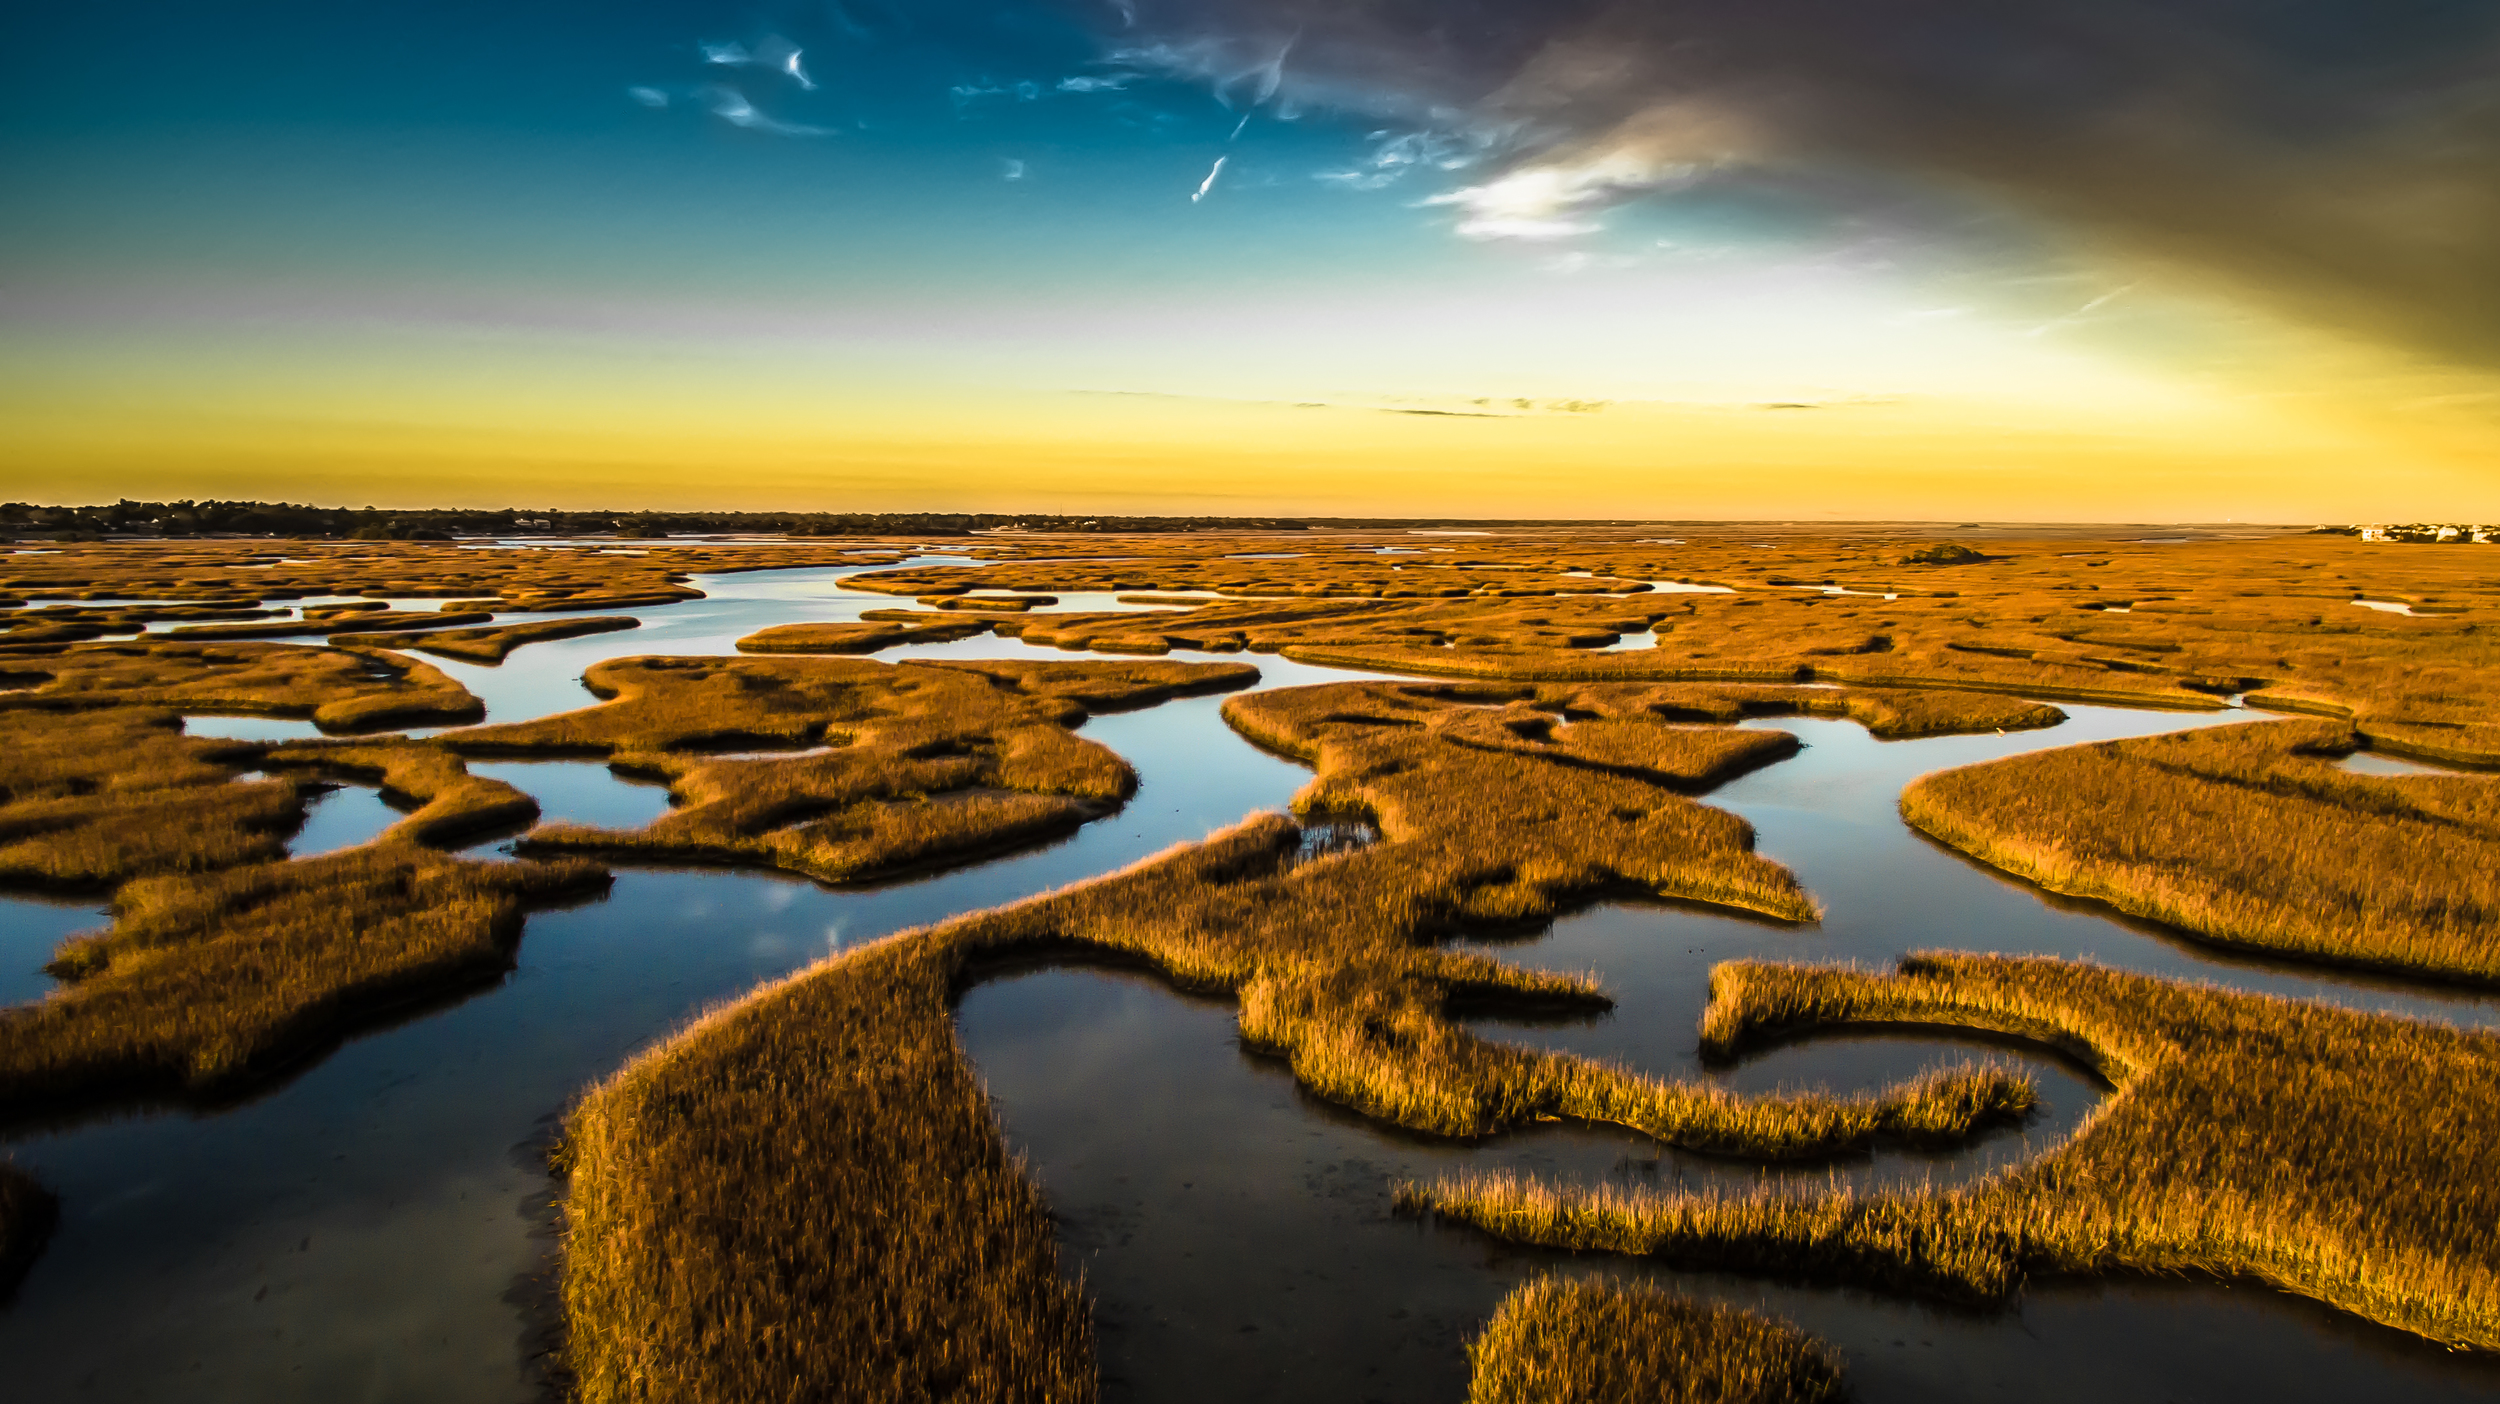 Marsh at dusk